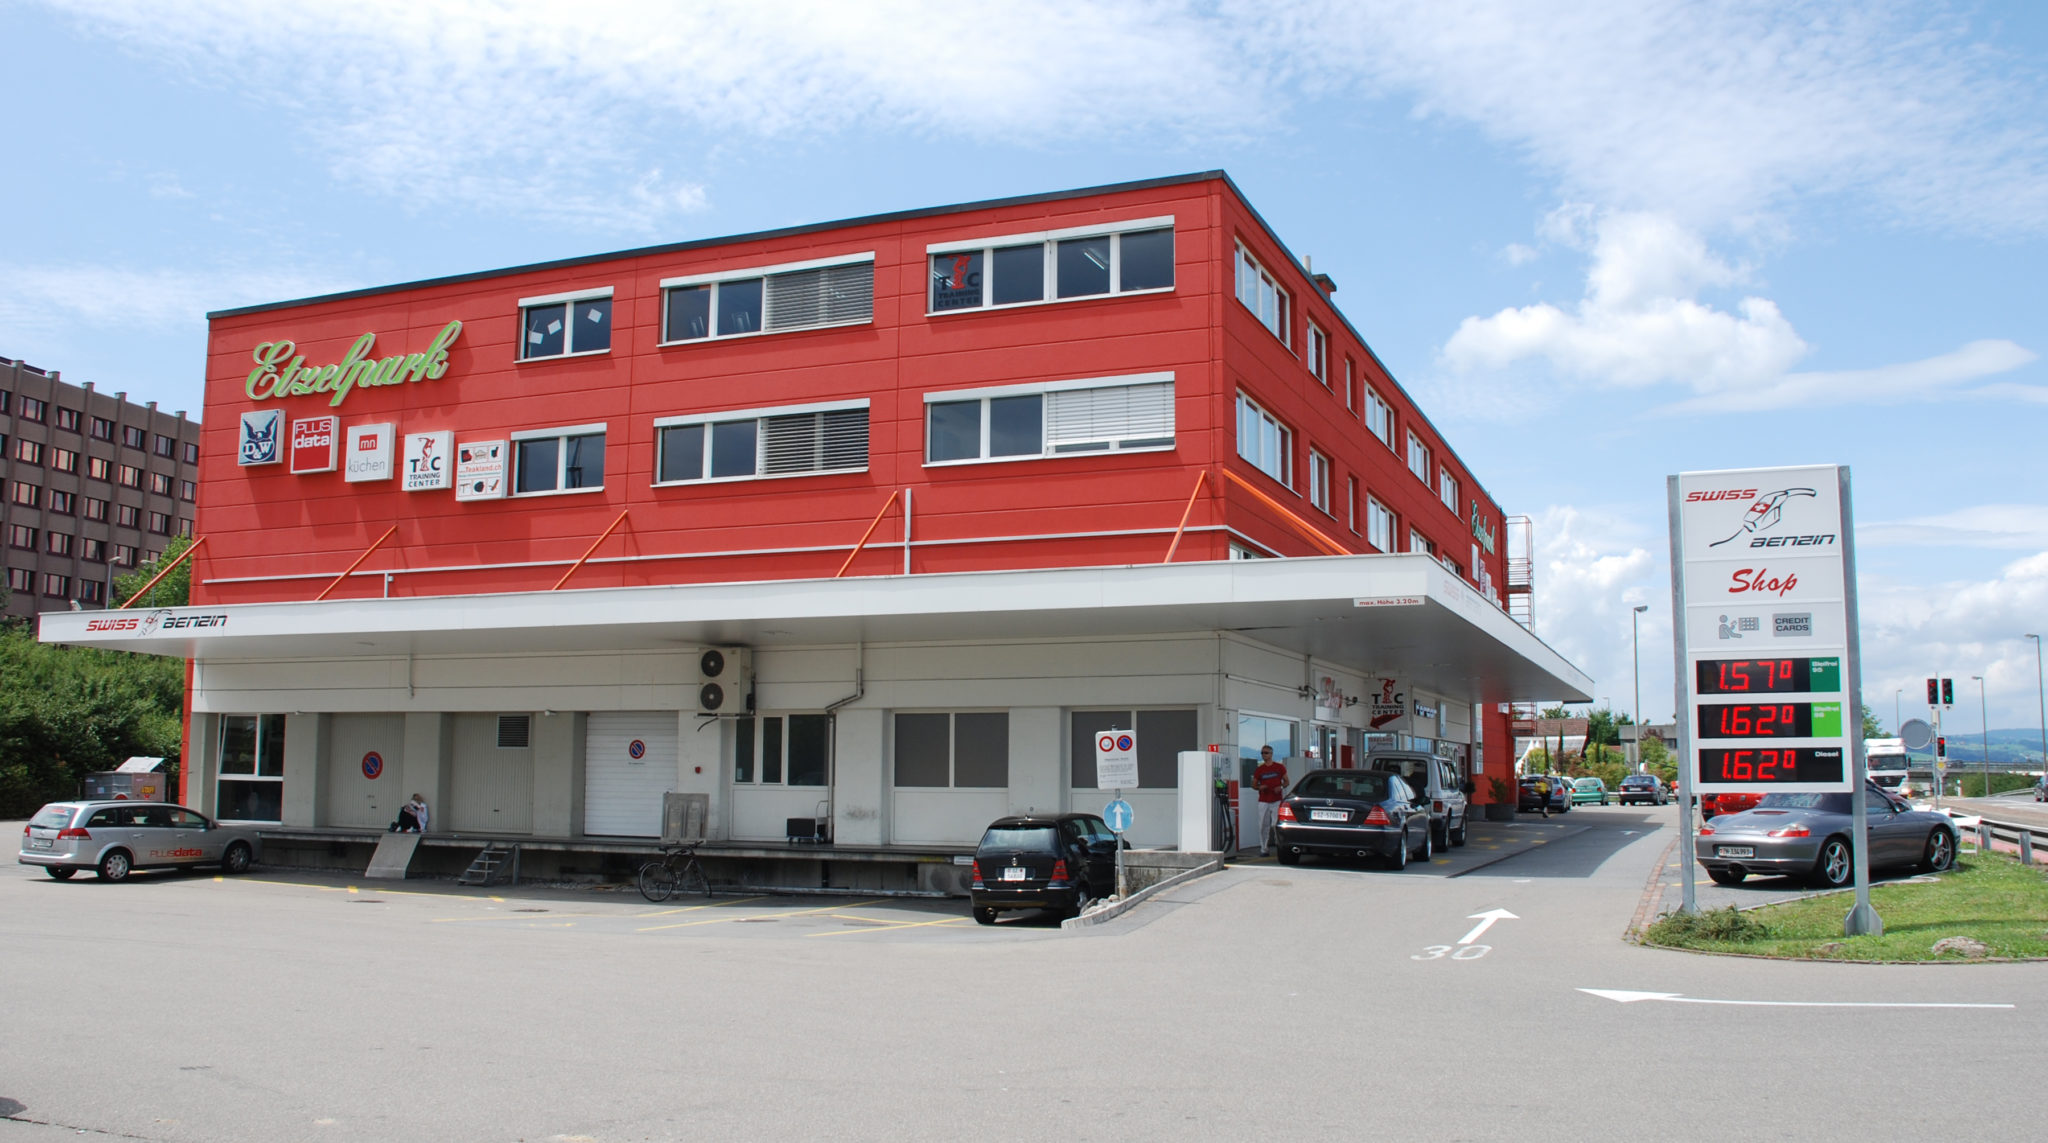 rotes Gebäude, Etzelpark, Churerstrasse 154, 8808 Pfäffikon SZ